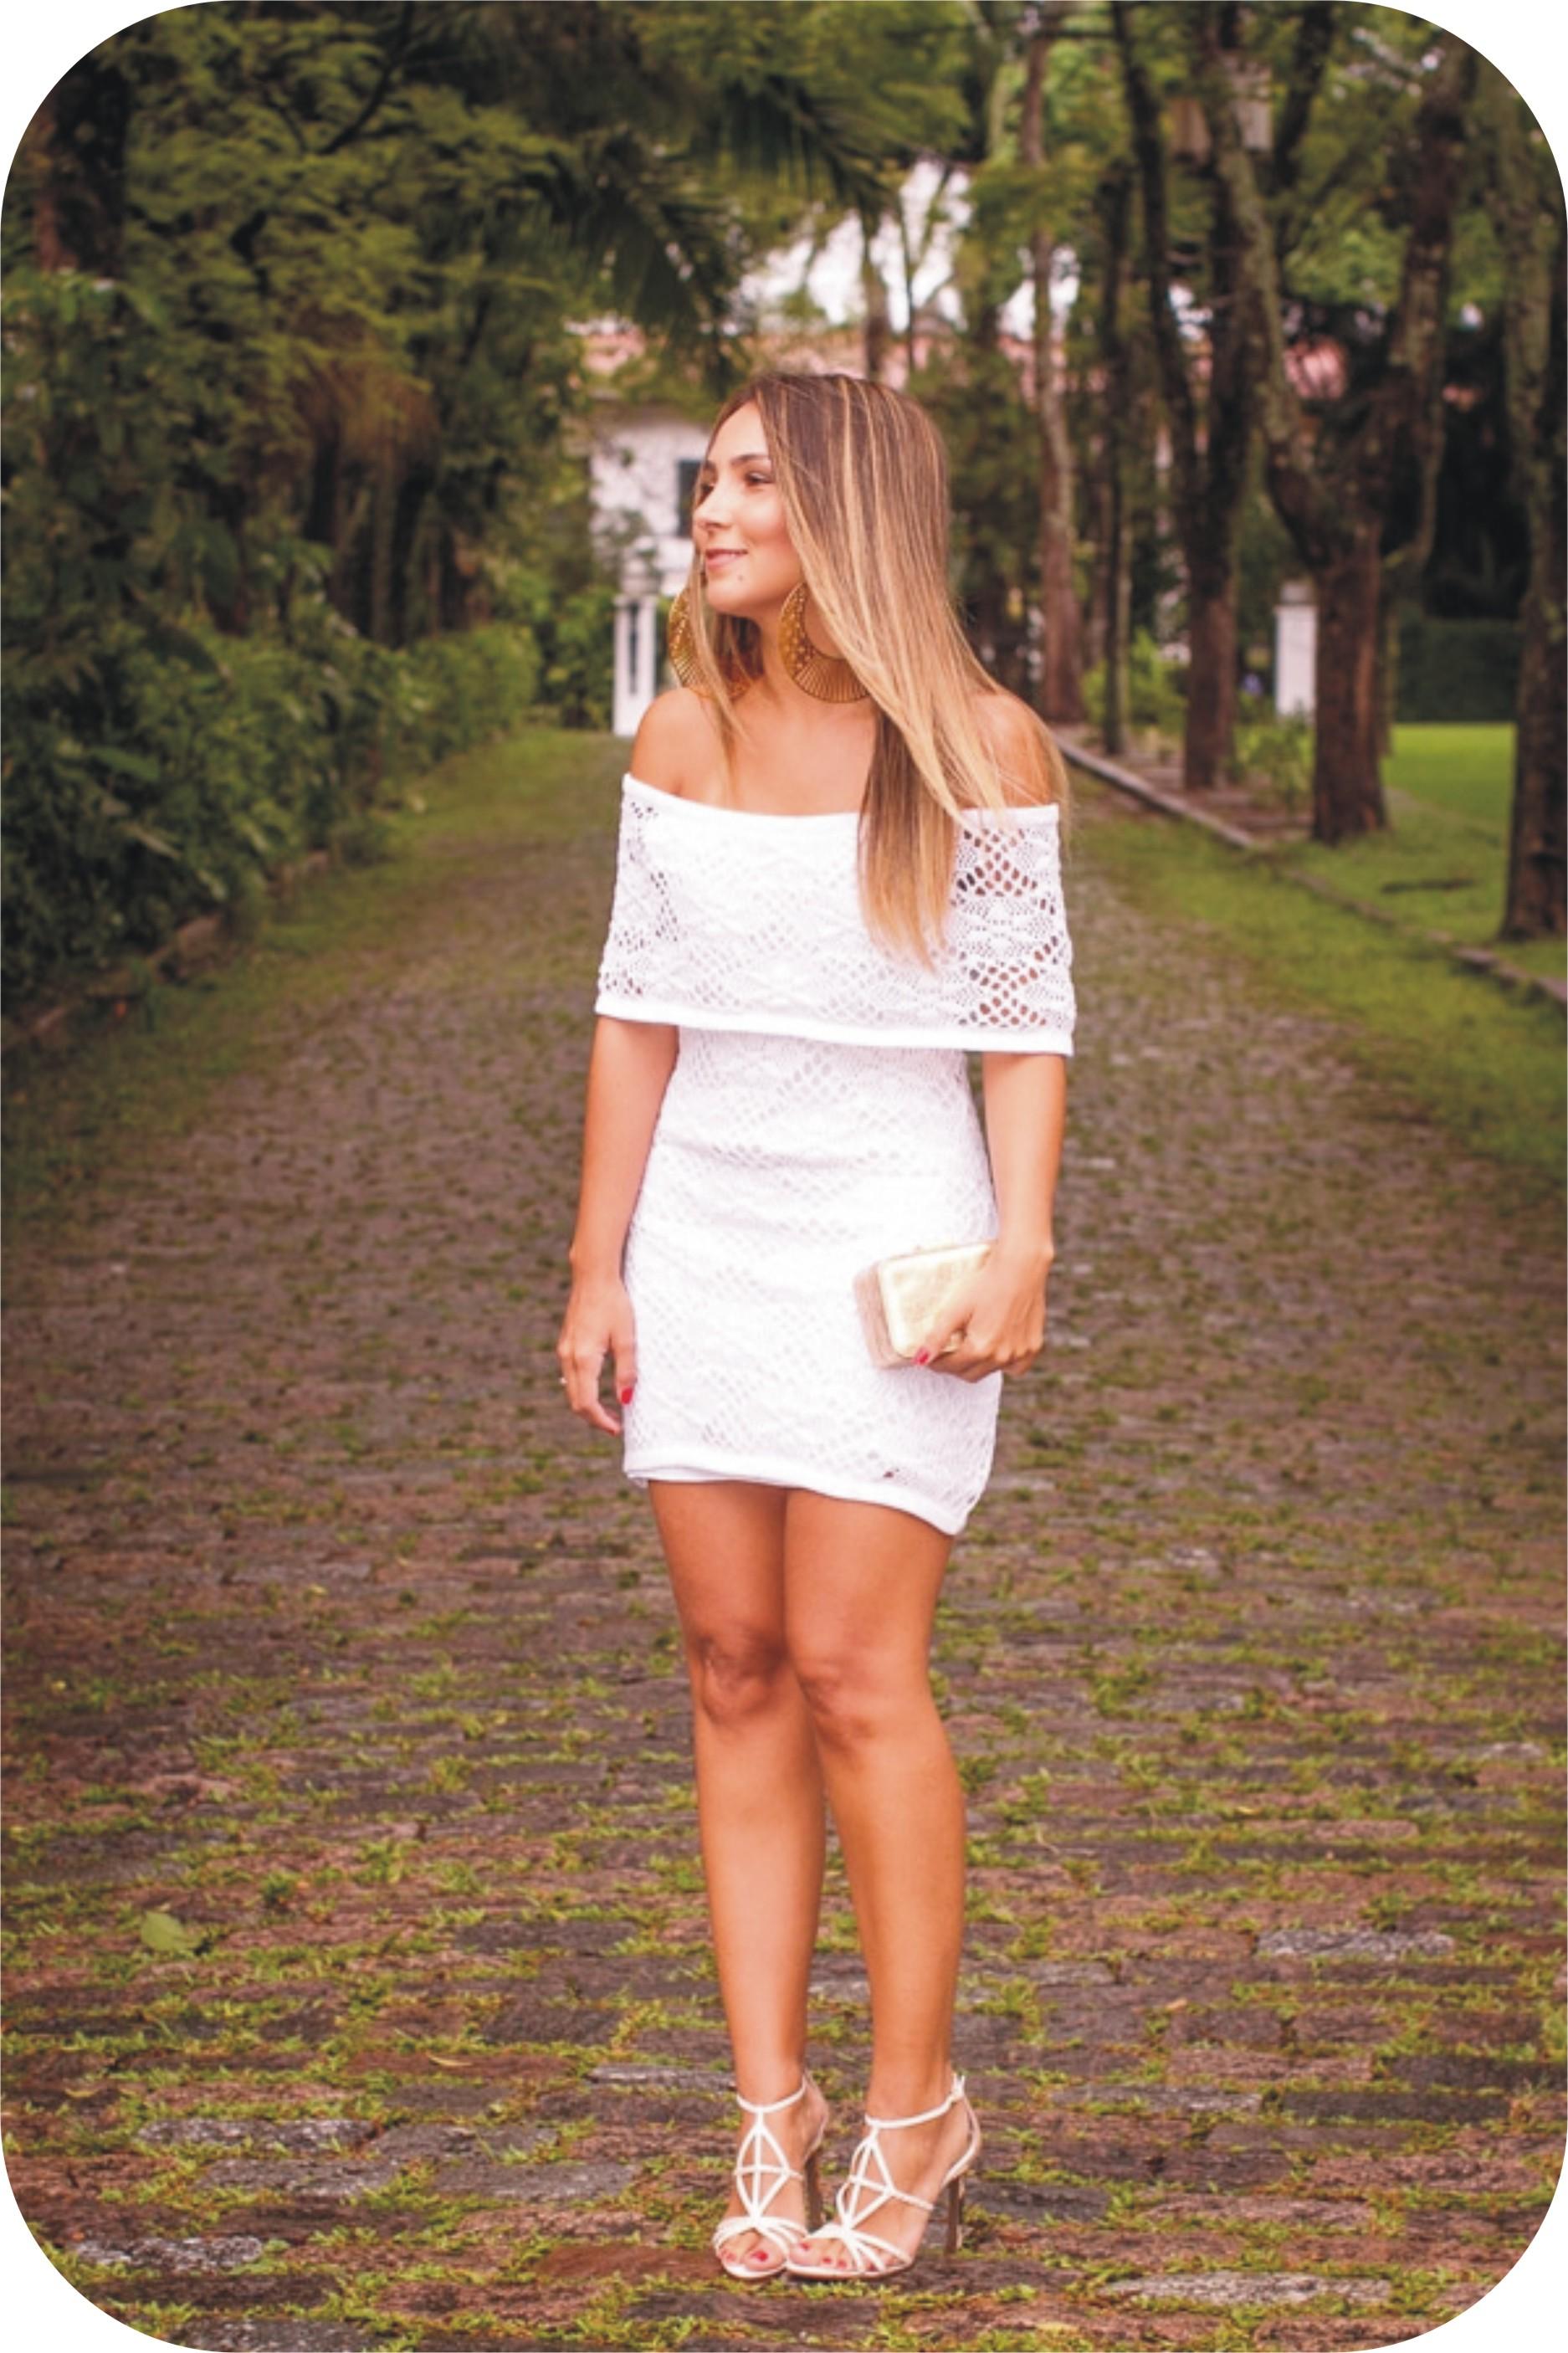 Vestido branco para festa durante o dia